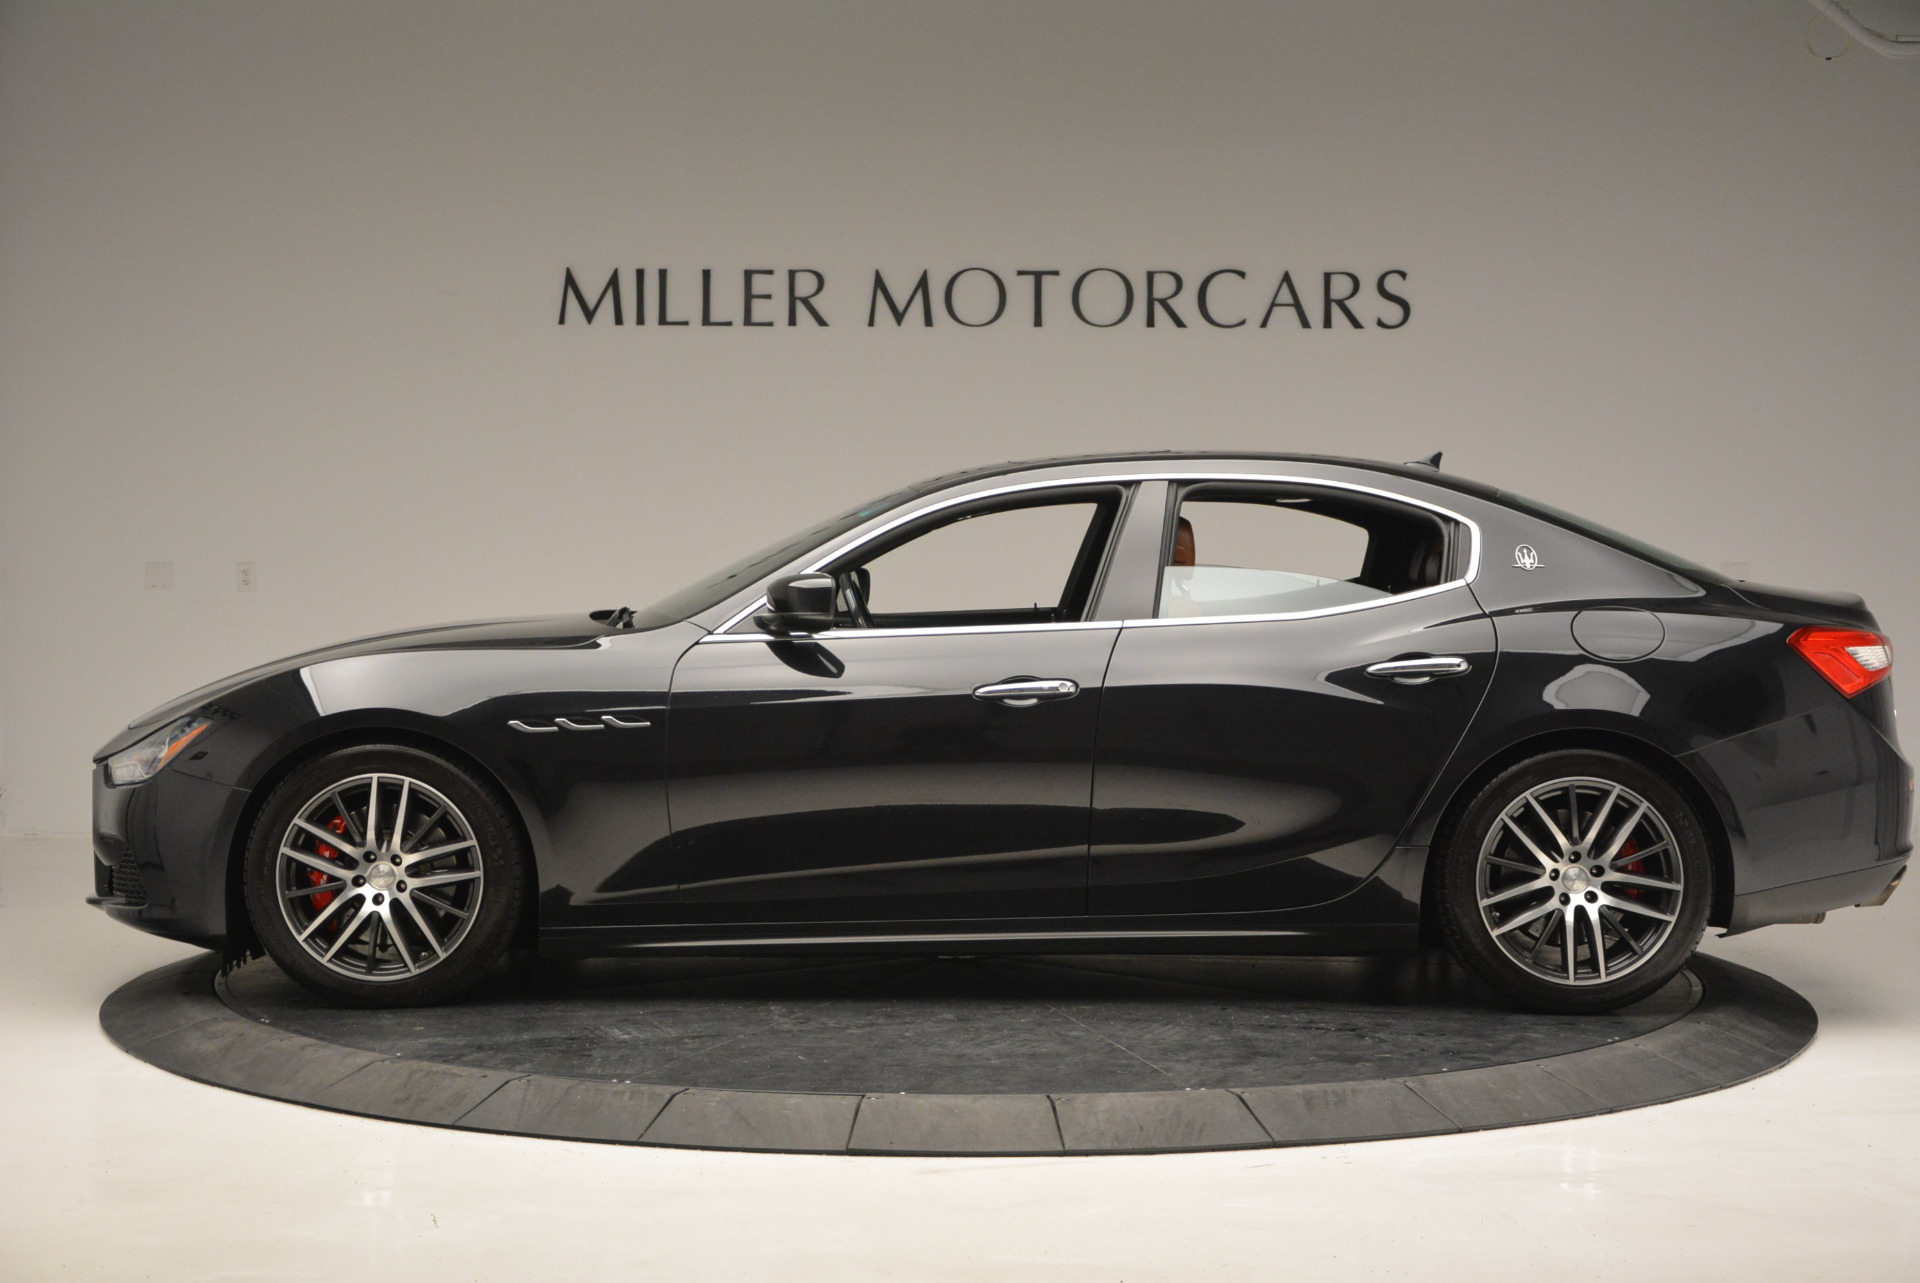 Used 2014 Maserati Ghibli S Q4 For Sale In Greenwich, CT. Alfa Romeo of Greenwich, 7132 805_p3